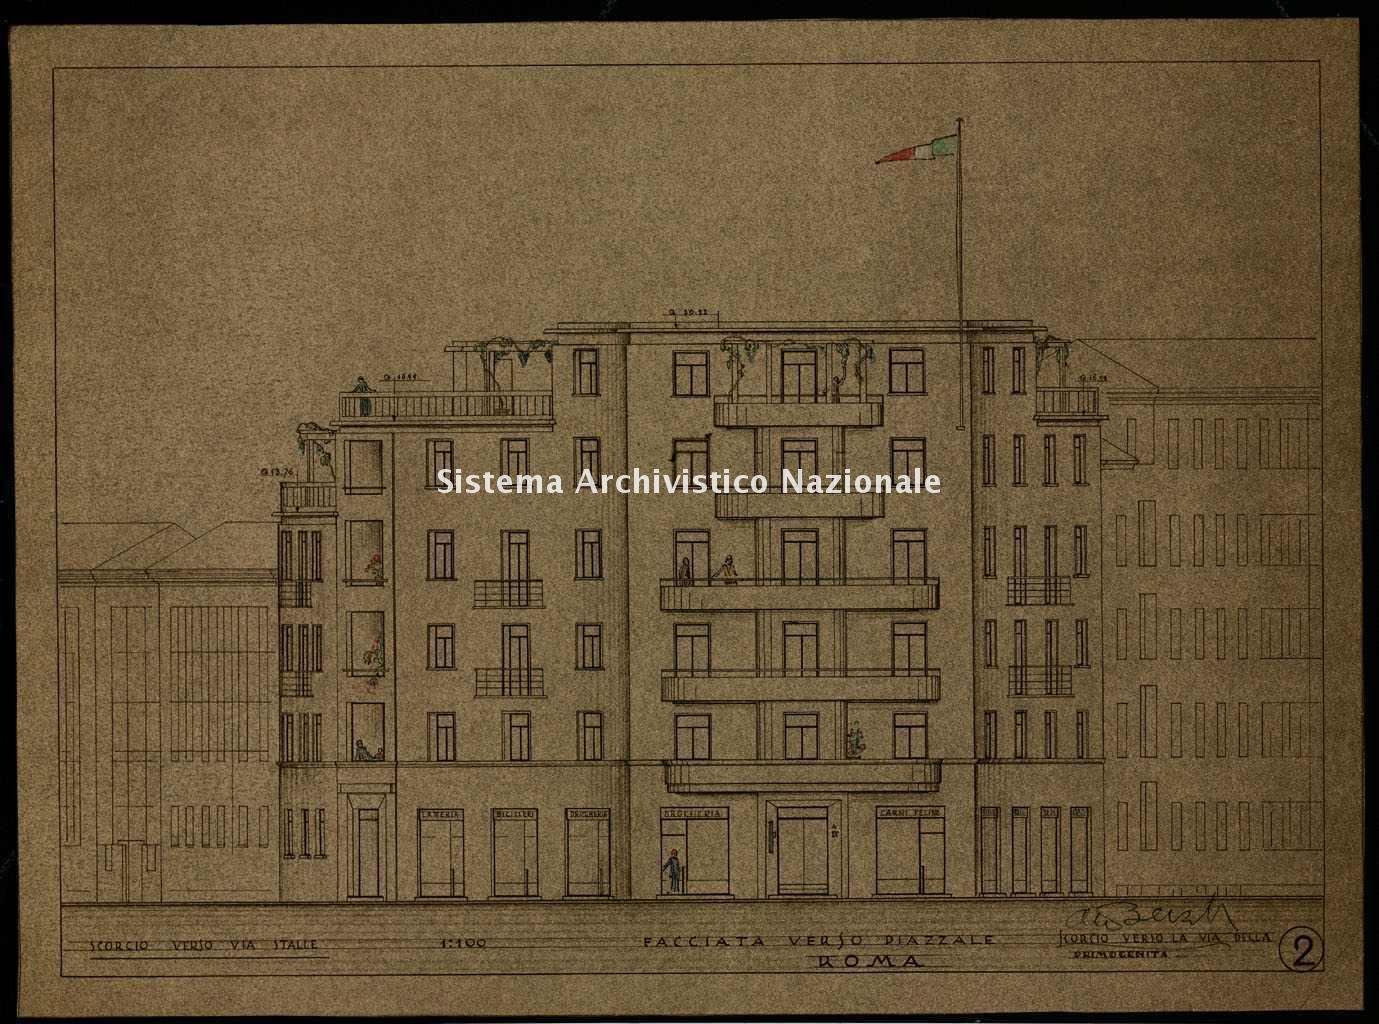 ASPC Mappe, stampe e disegni, n. 6496